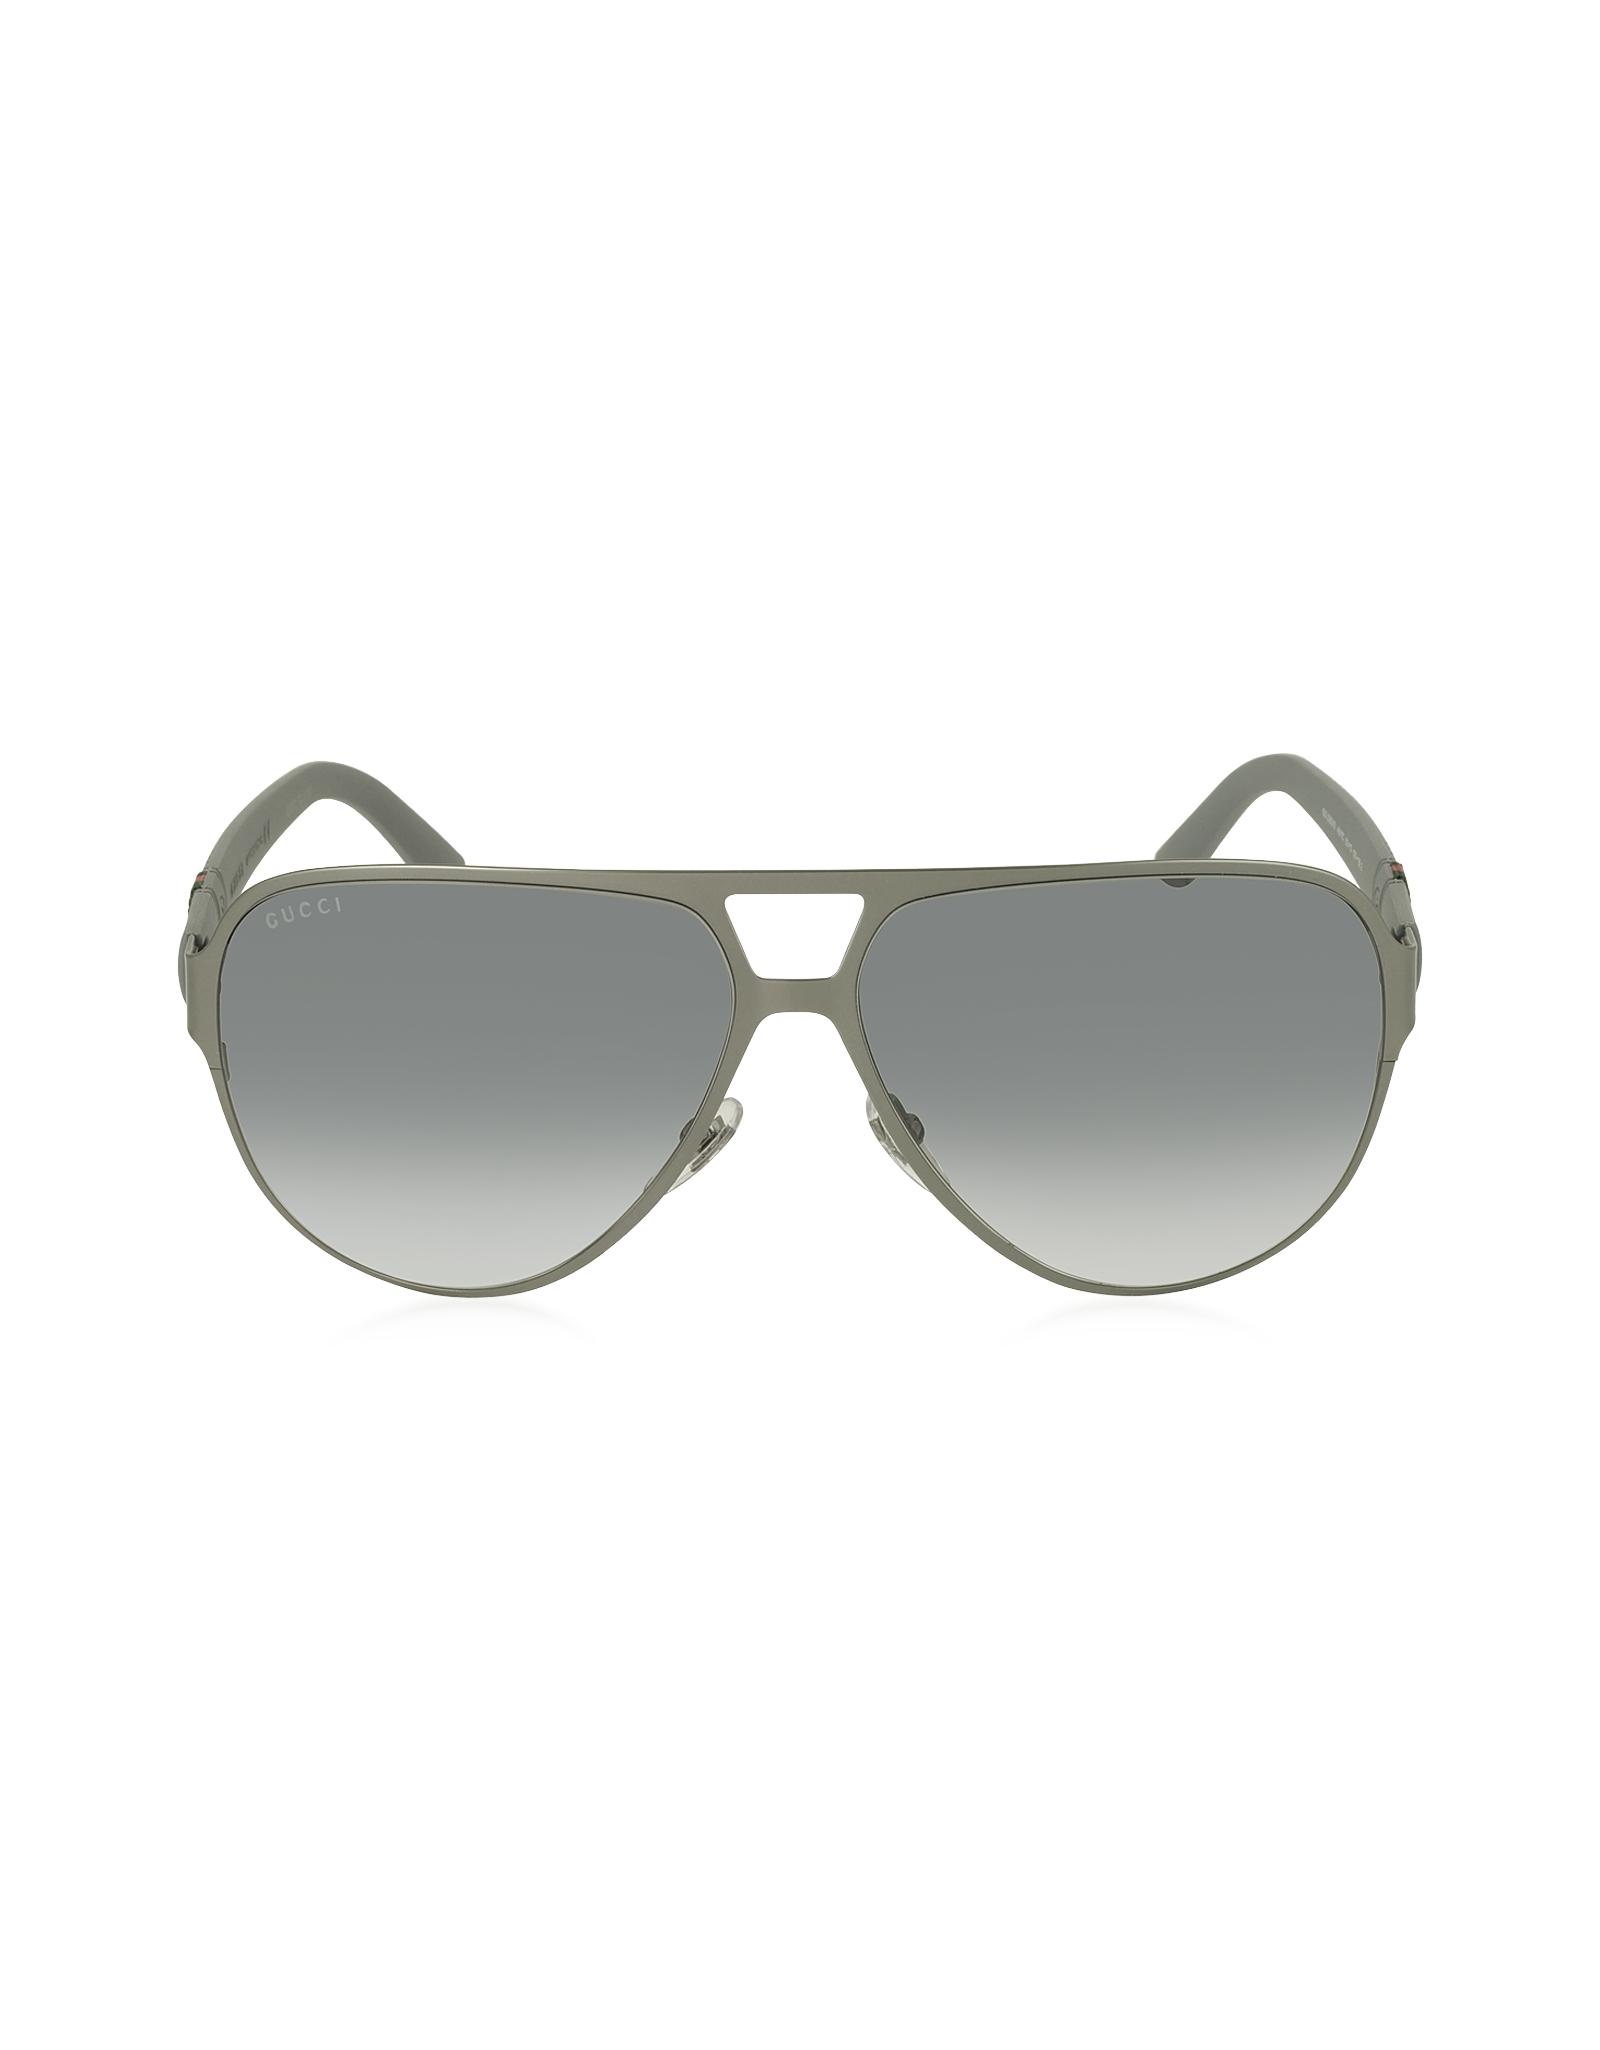 b96293dbcba8a Gucci Mens Aviator Sunglasses Gg 2252 S - Kidds Place